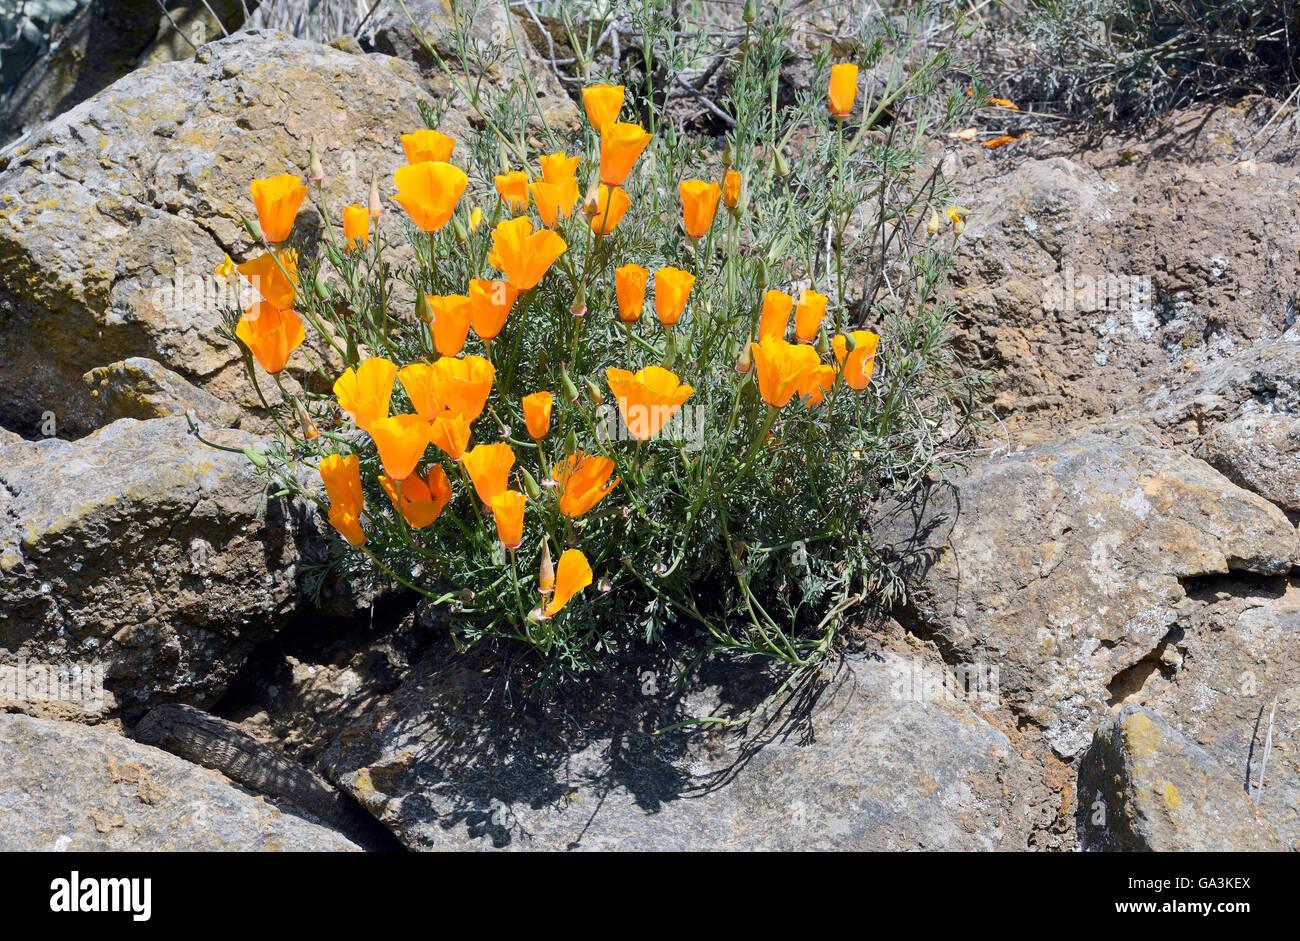 Poppy flowers, california poppy, golden poppy (Eschscholzia californica), Canary Islands, Tenerife, Spain - Stock Image